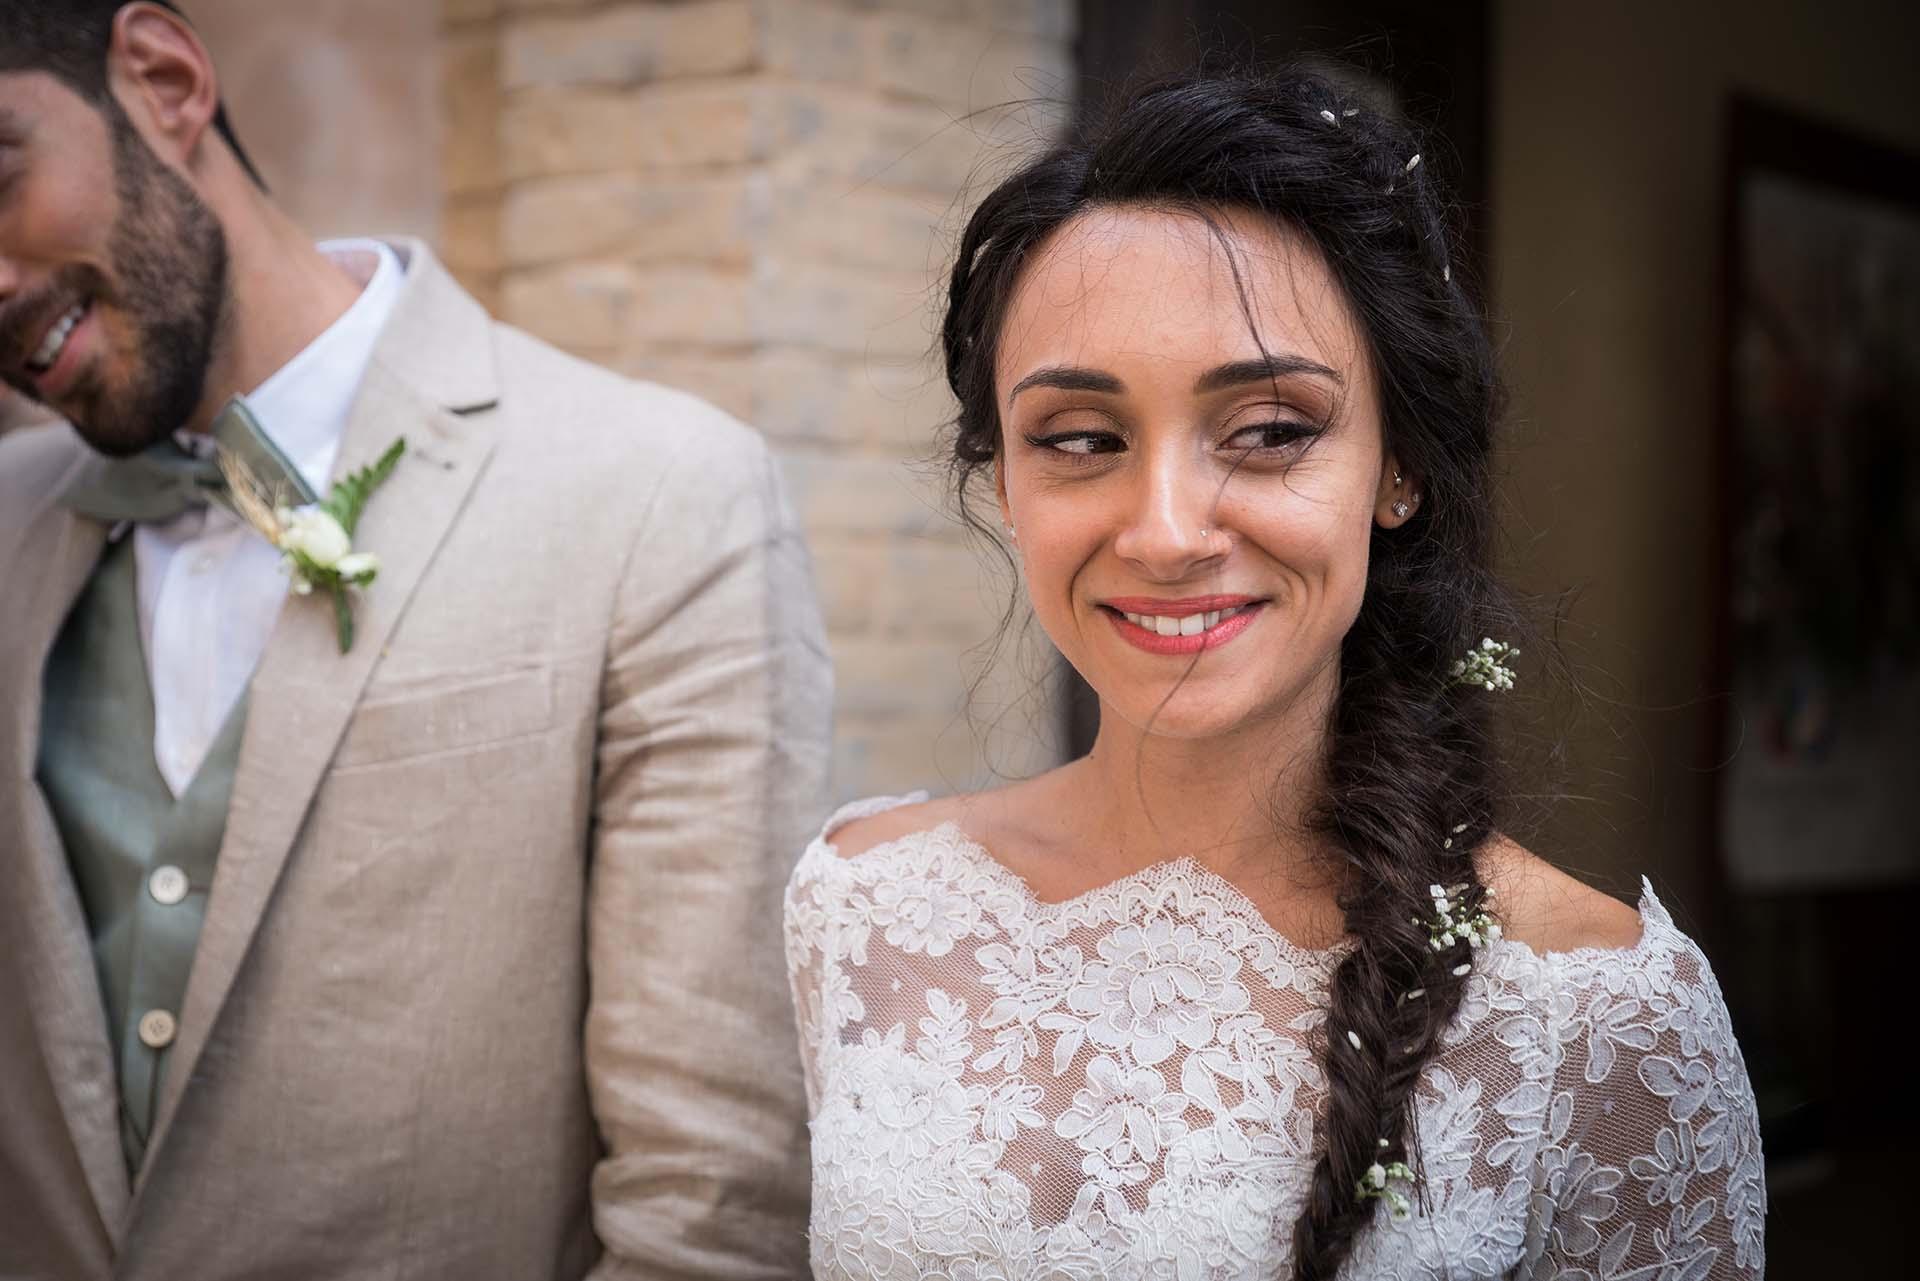 TRUCCO SPOSA Martina Lizzani Beauty Image Lab MakeUp Artist Roma Portfolio 093b